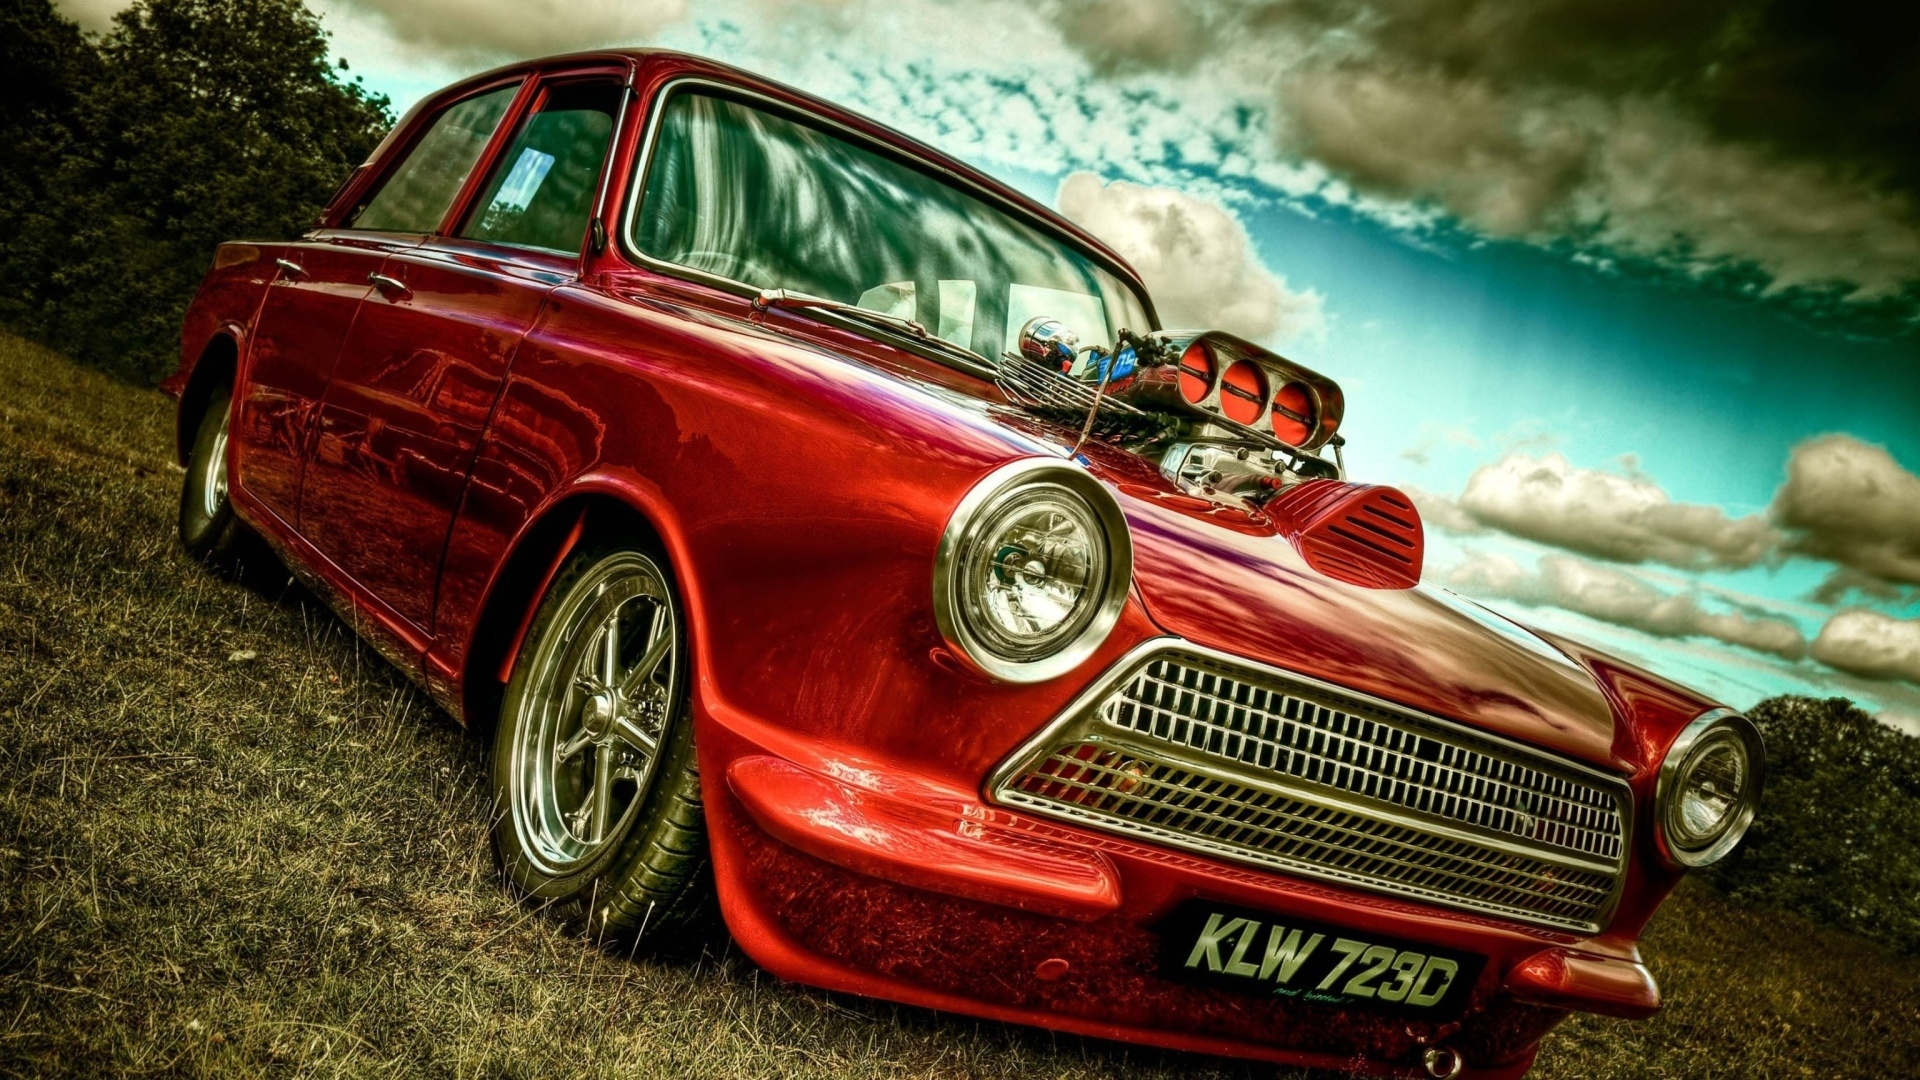 Cars 1920x1080 wallpaper